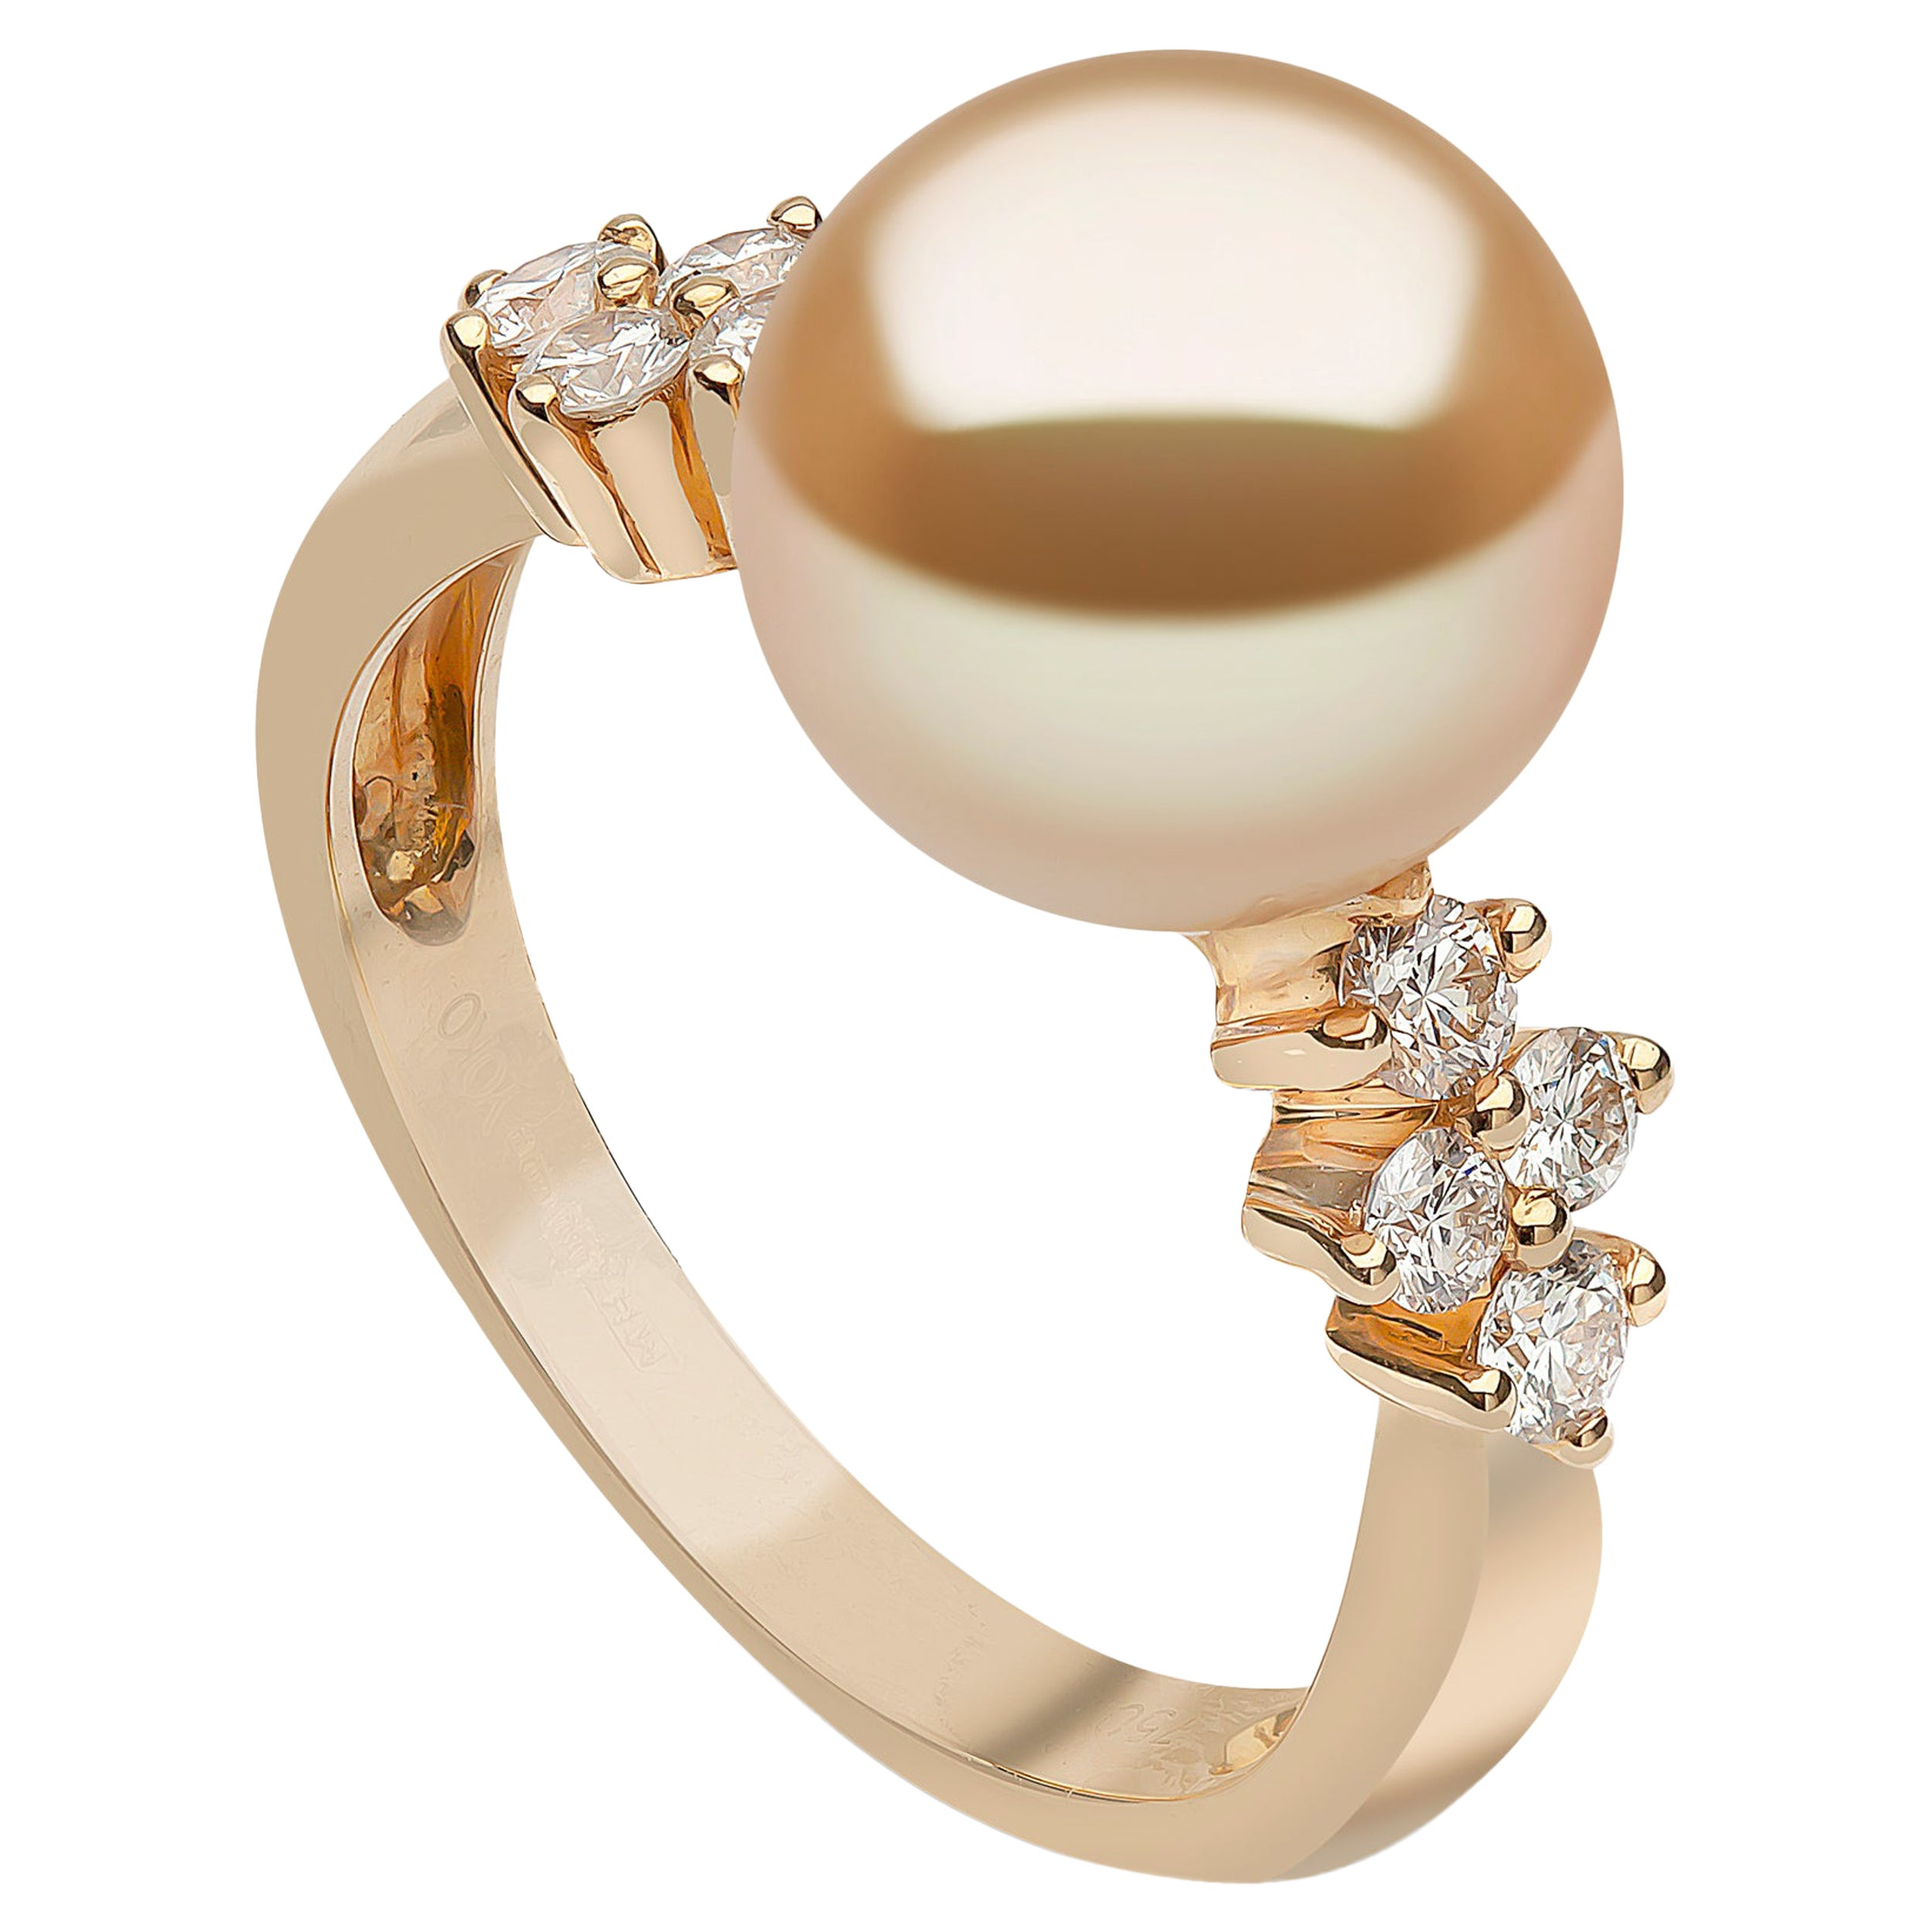 Yoko London Golden South Sea Pearl and Diamond Ring in 18 Karat Yellow Gold